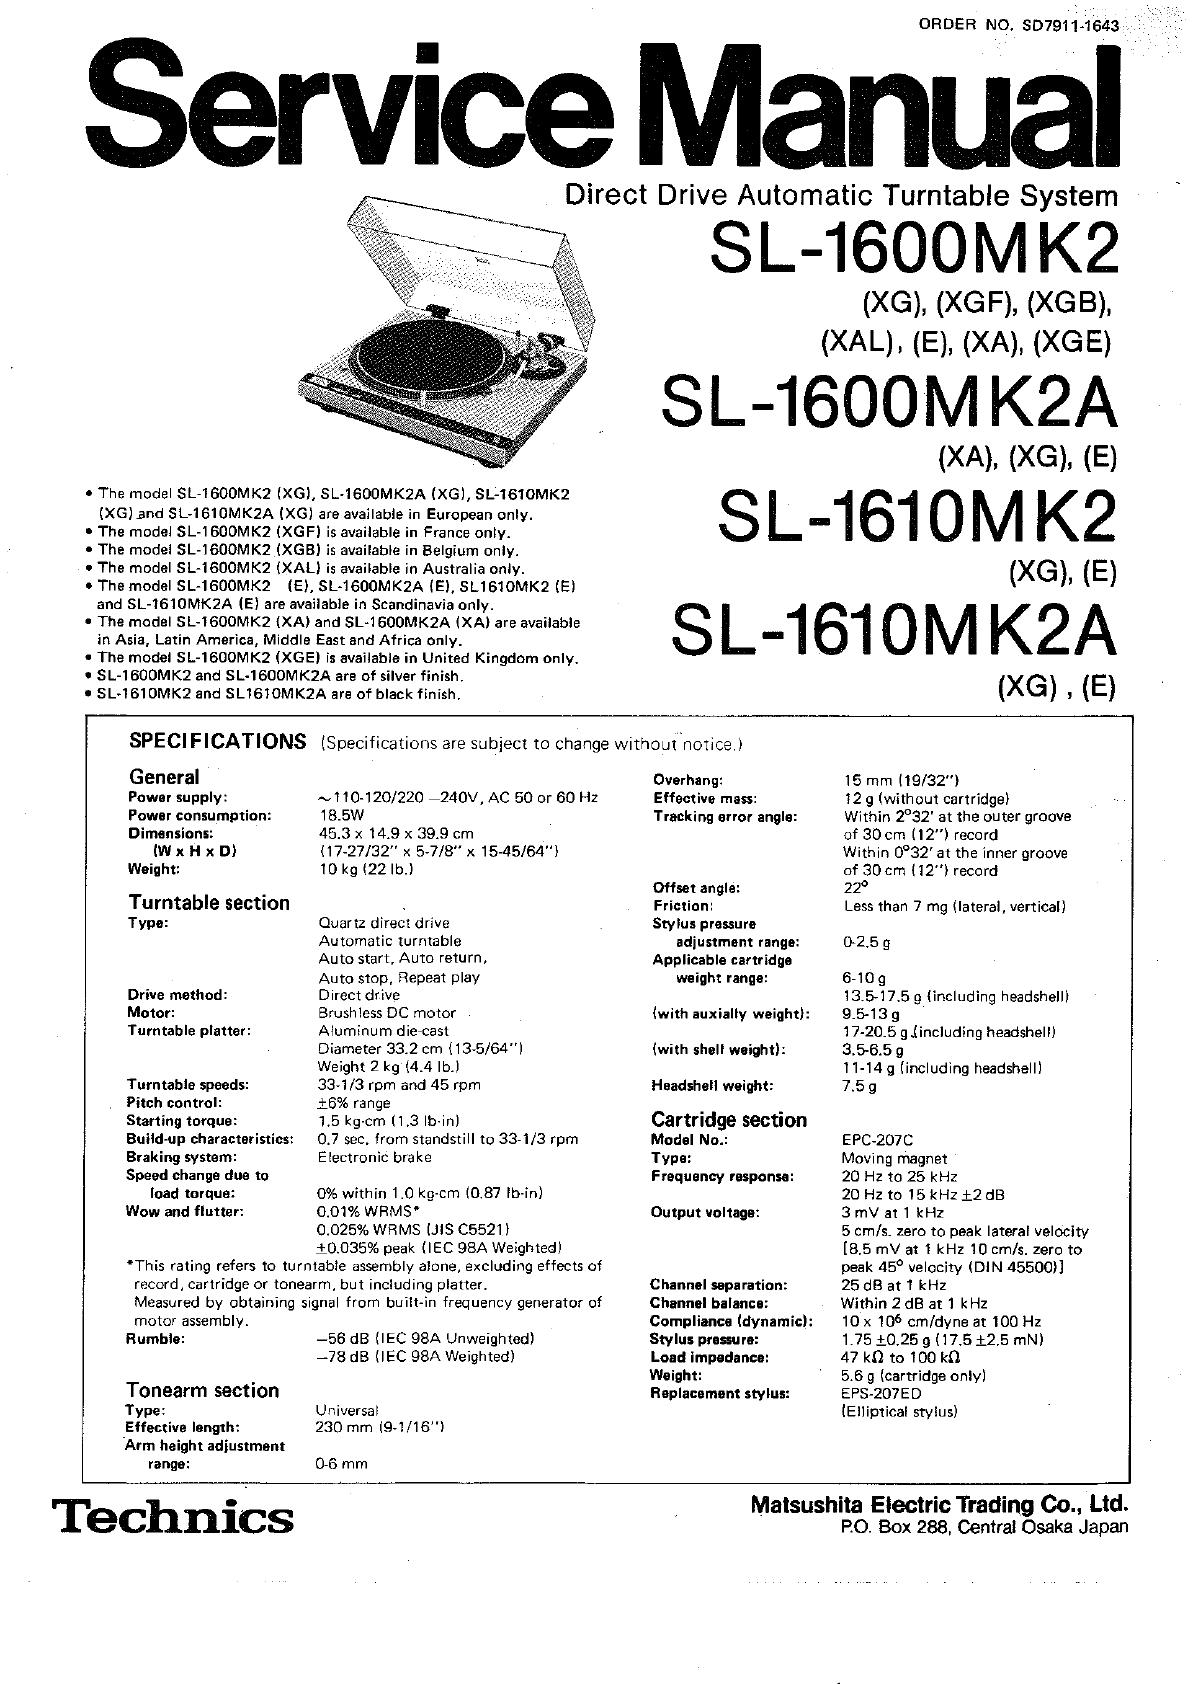 Technics Wiring Diagram And Schematics Turntable Sl 1600 Mk2 Service Manual 2000